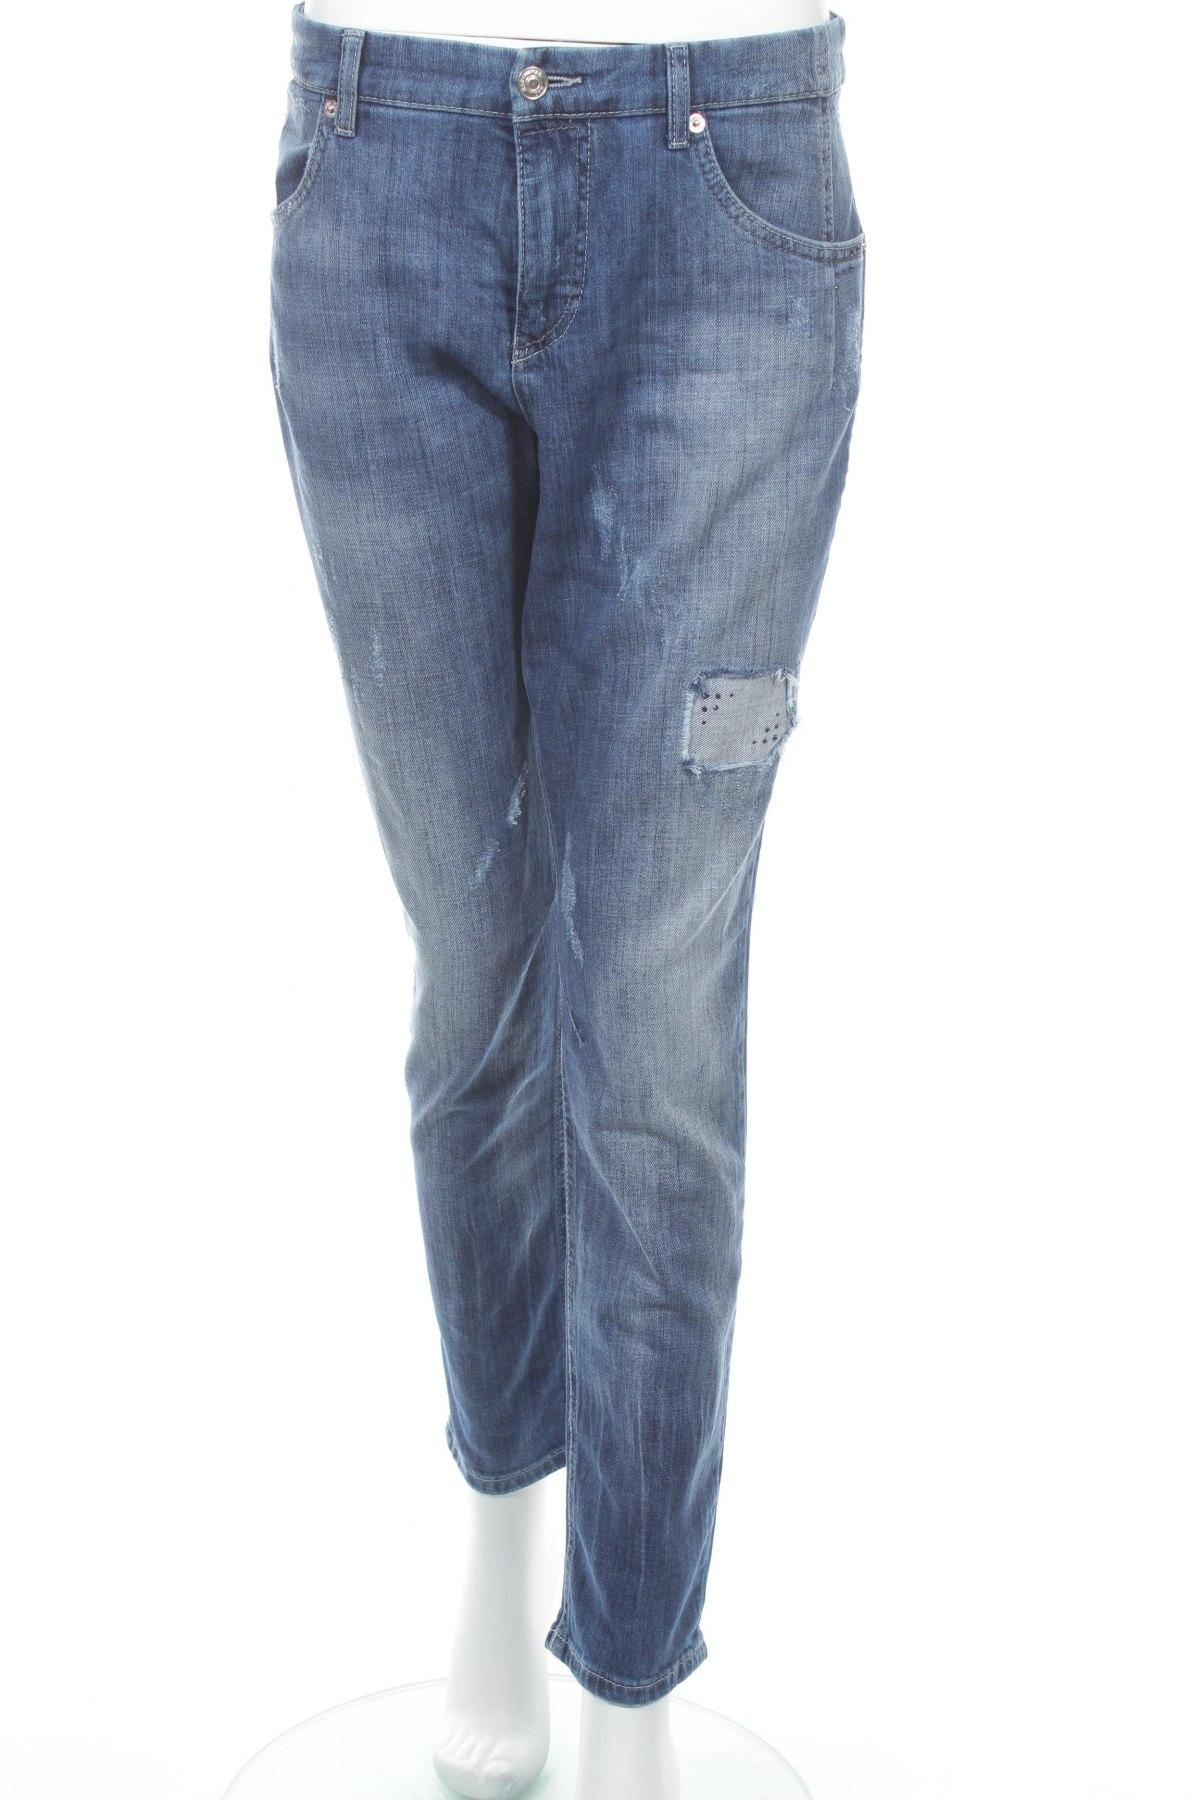 damskie jeansy mac jeans 8239403 remix. Black Bedroom Furniture Sets. Home Design Ideas